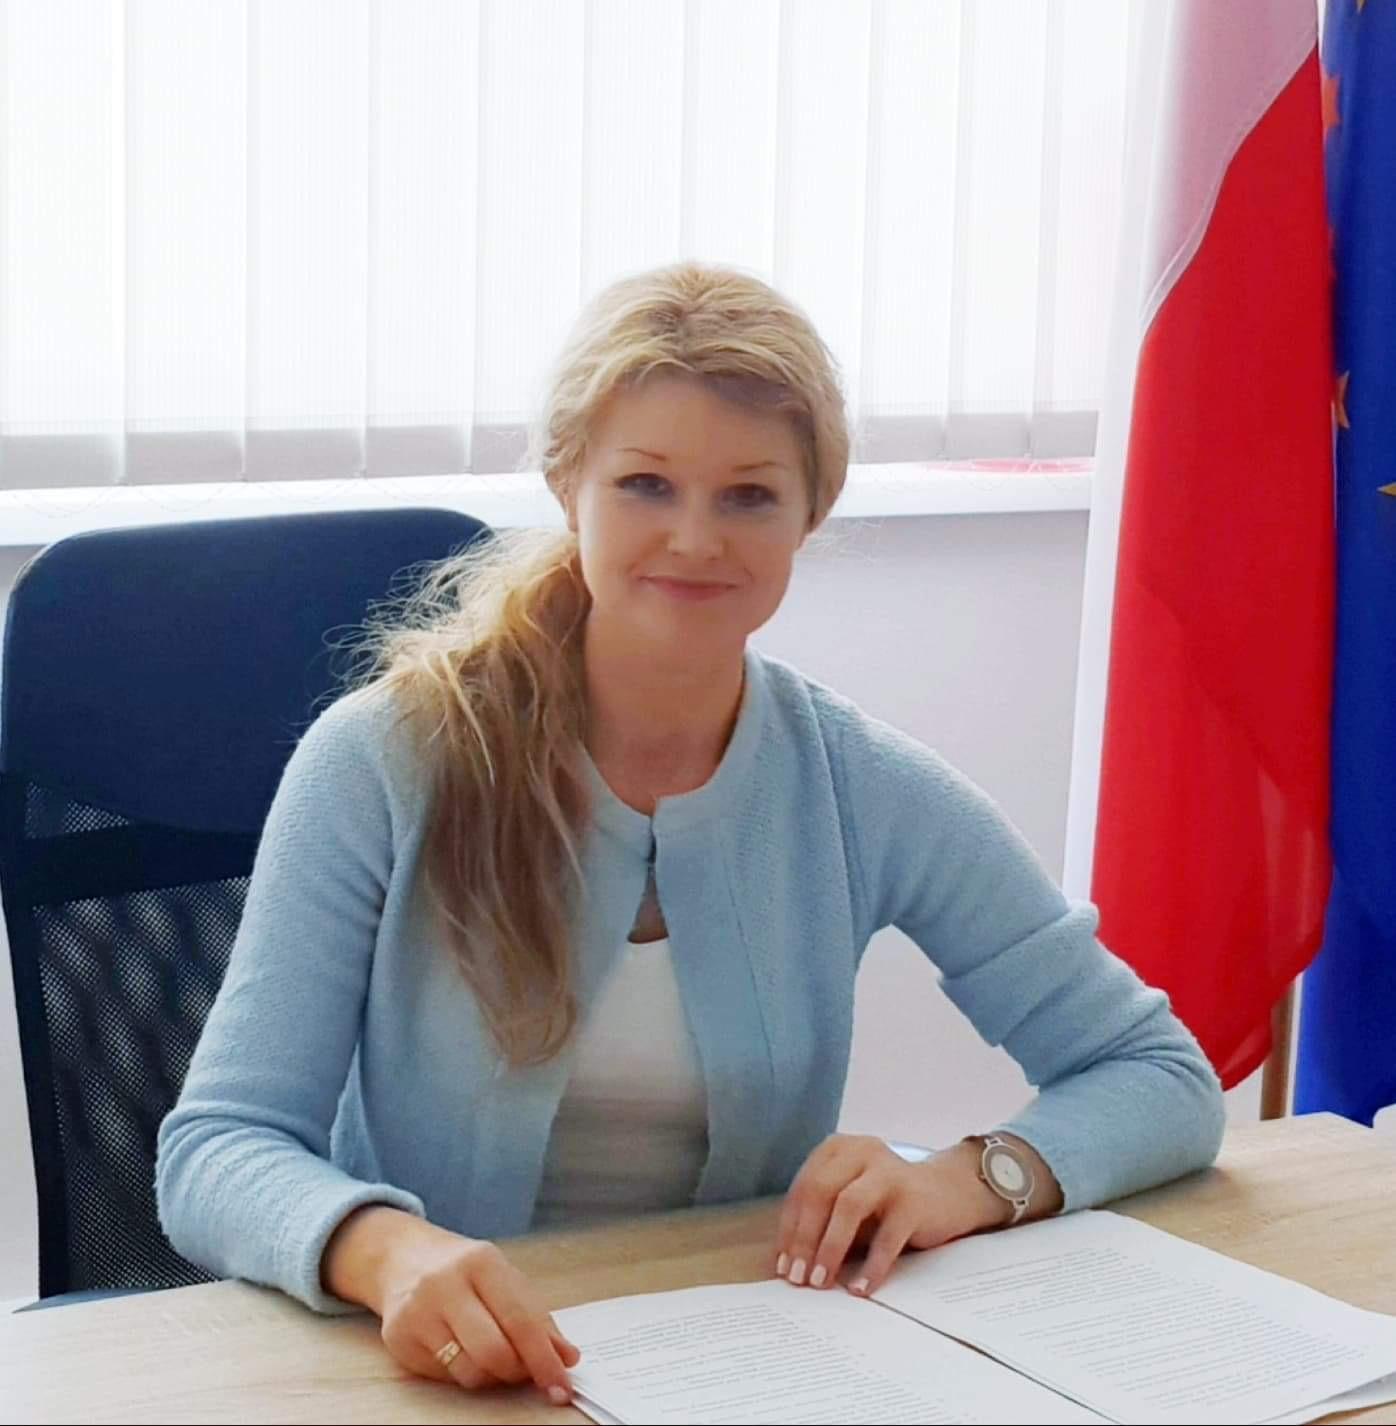 Karolina_Pawliczak